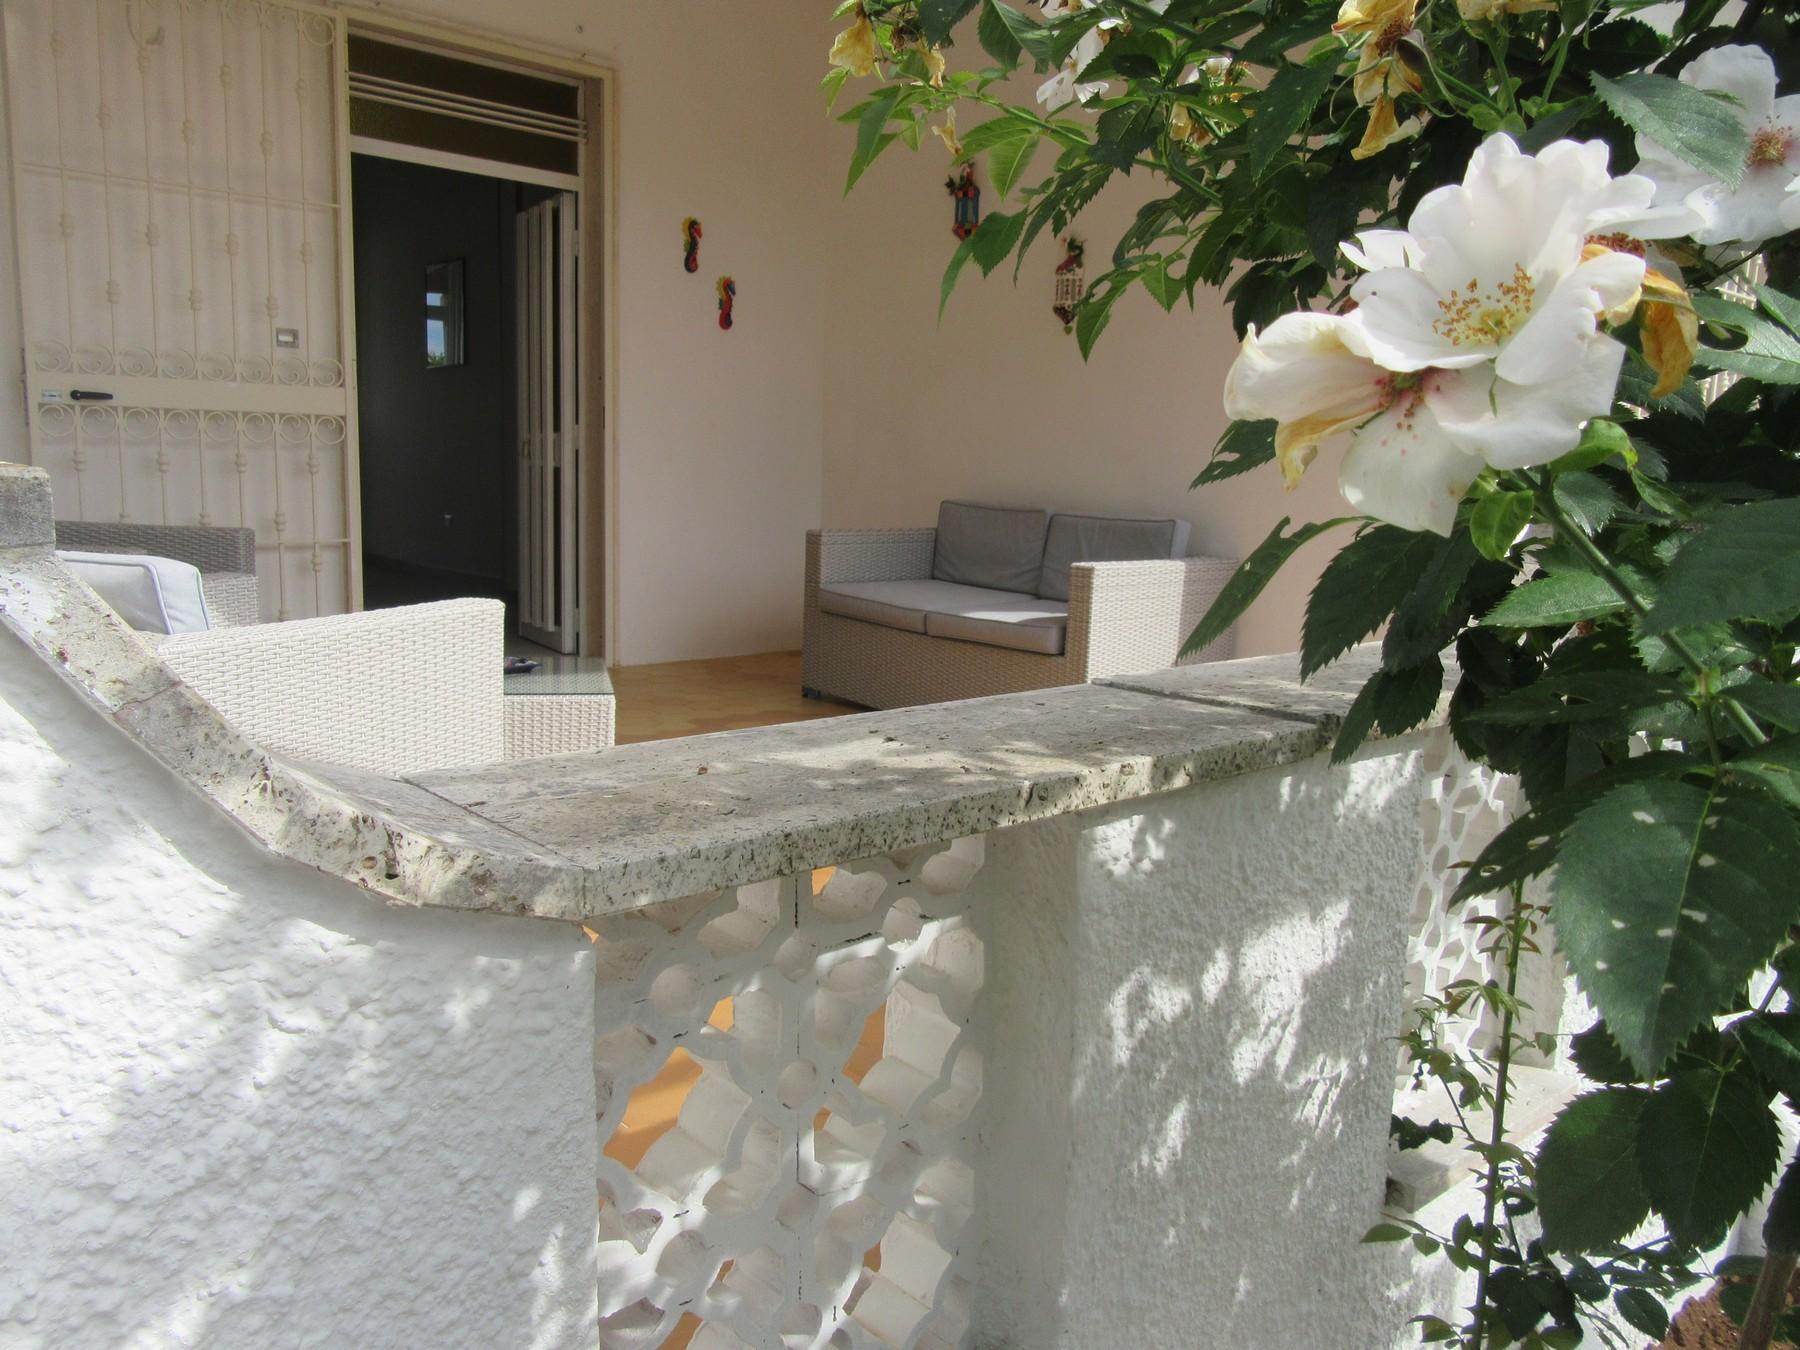 Ferienhaus Villa Mariposa n°3, only 200 meters from the beach (2354067), Porto Cesareo, Lecce, Apulien, Italien, Bild 1